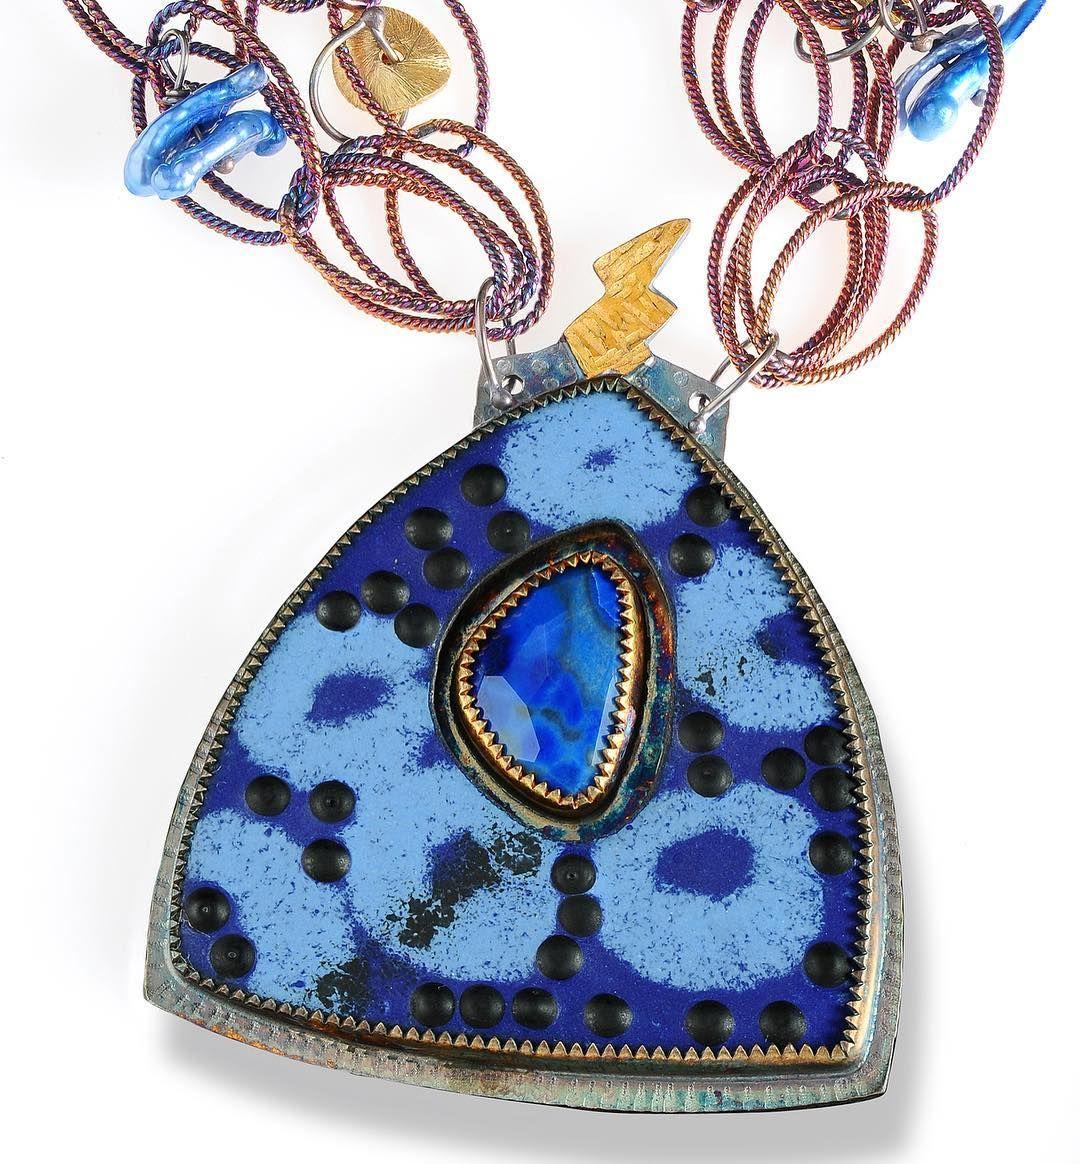 JULIE SHAW | #artridercraftswestport #brooklynmuseumartshow #enameljewelry #oneofakindjewelry #stones #rings #totems had to post again loving blues